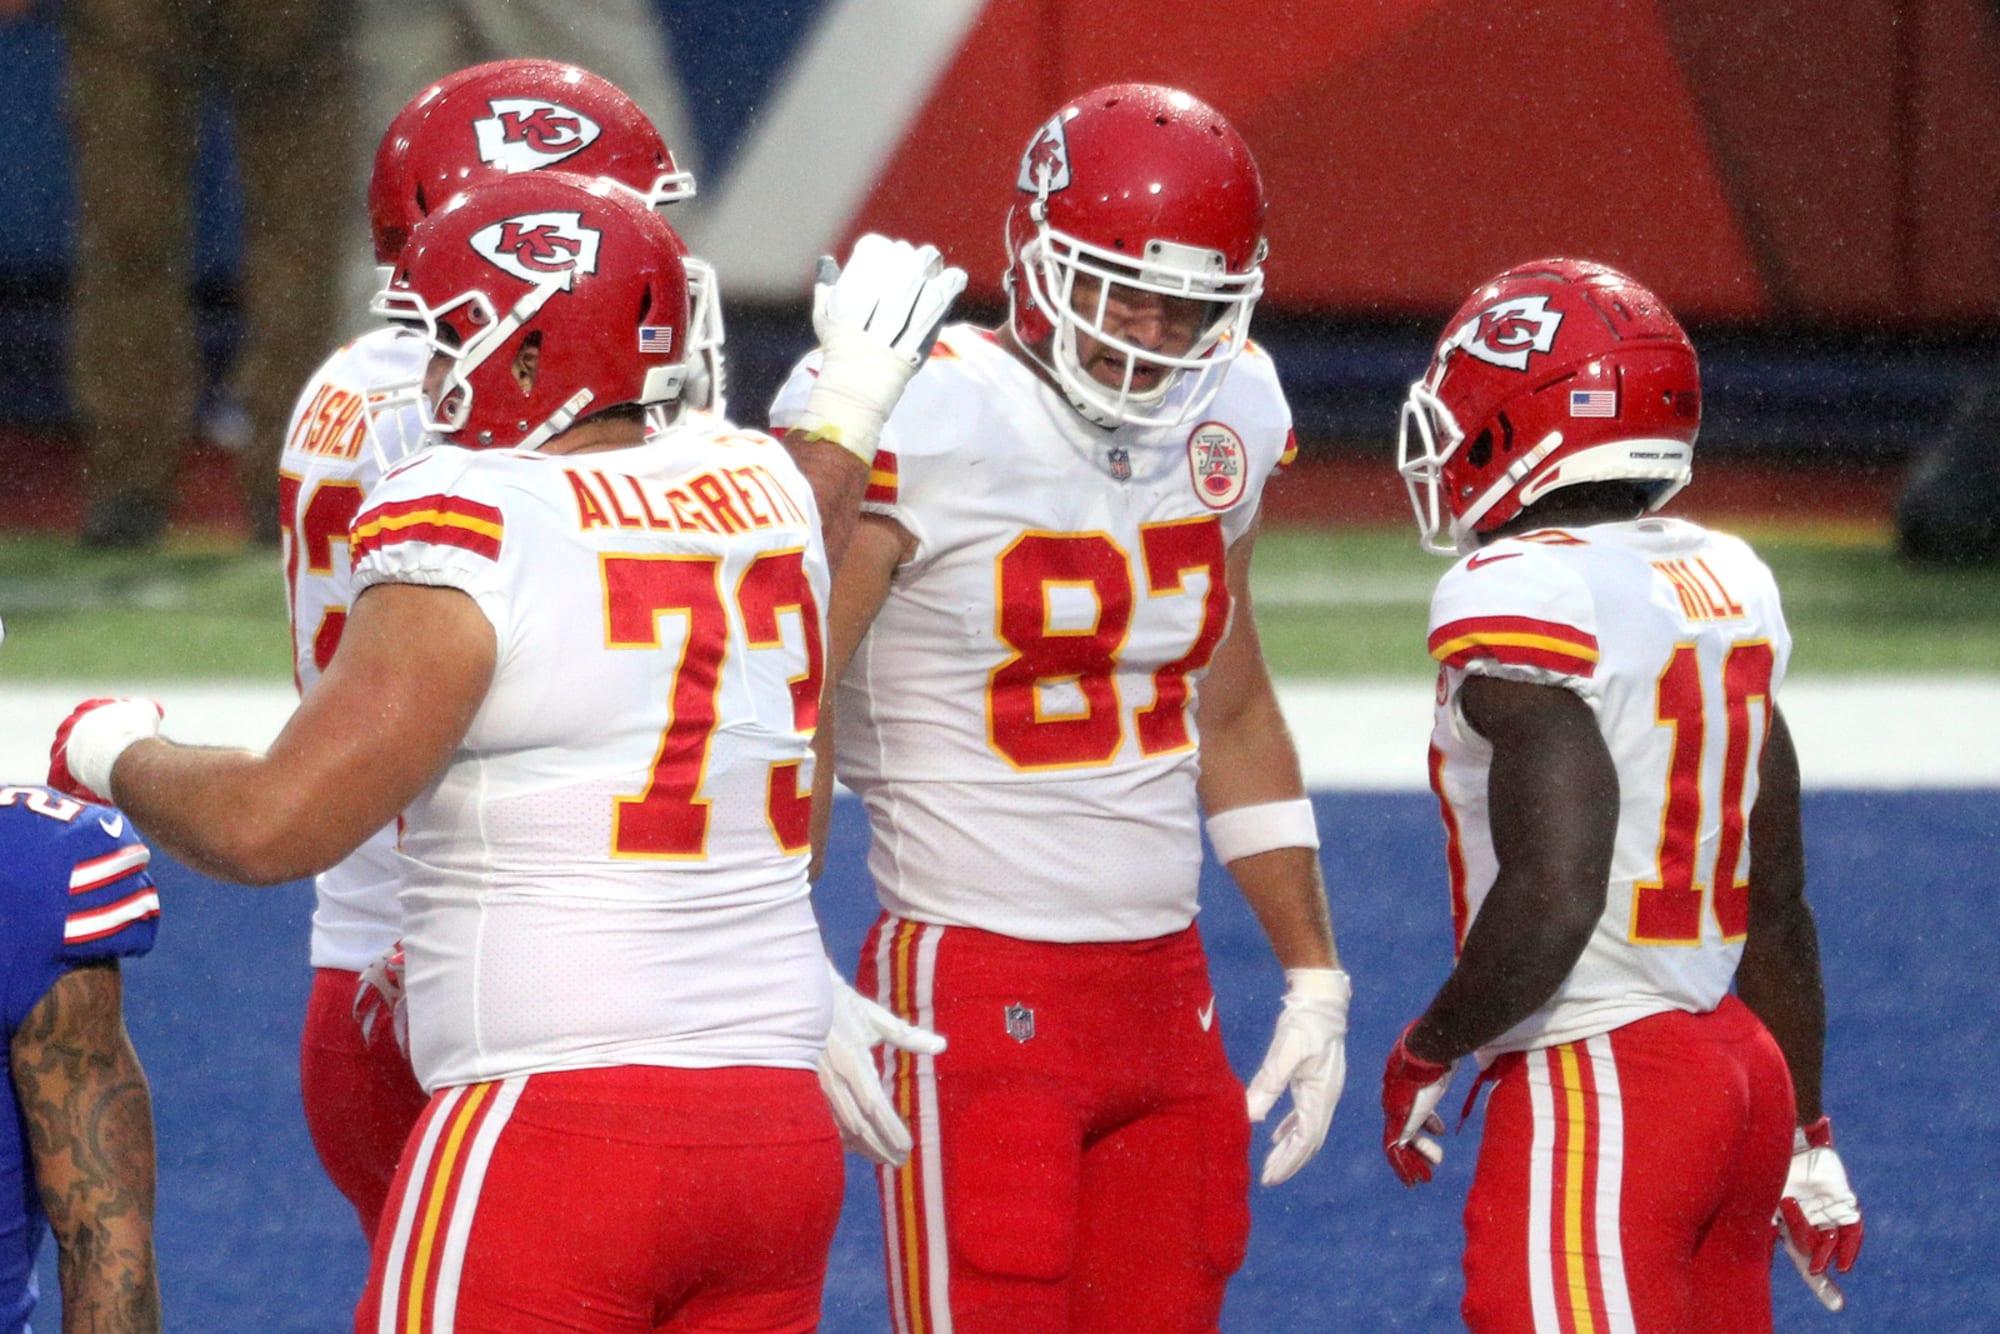 Kansas City Chiefs: Six star performances vs Bills in Week 6